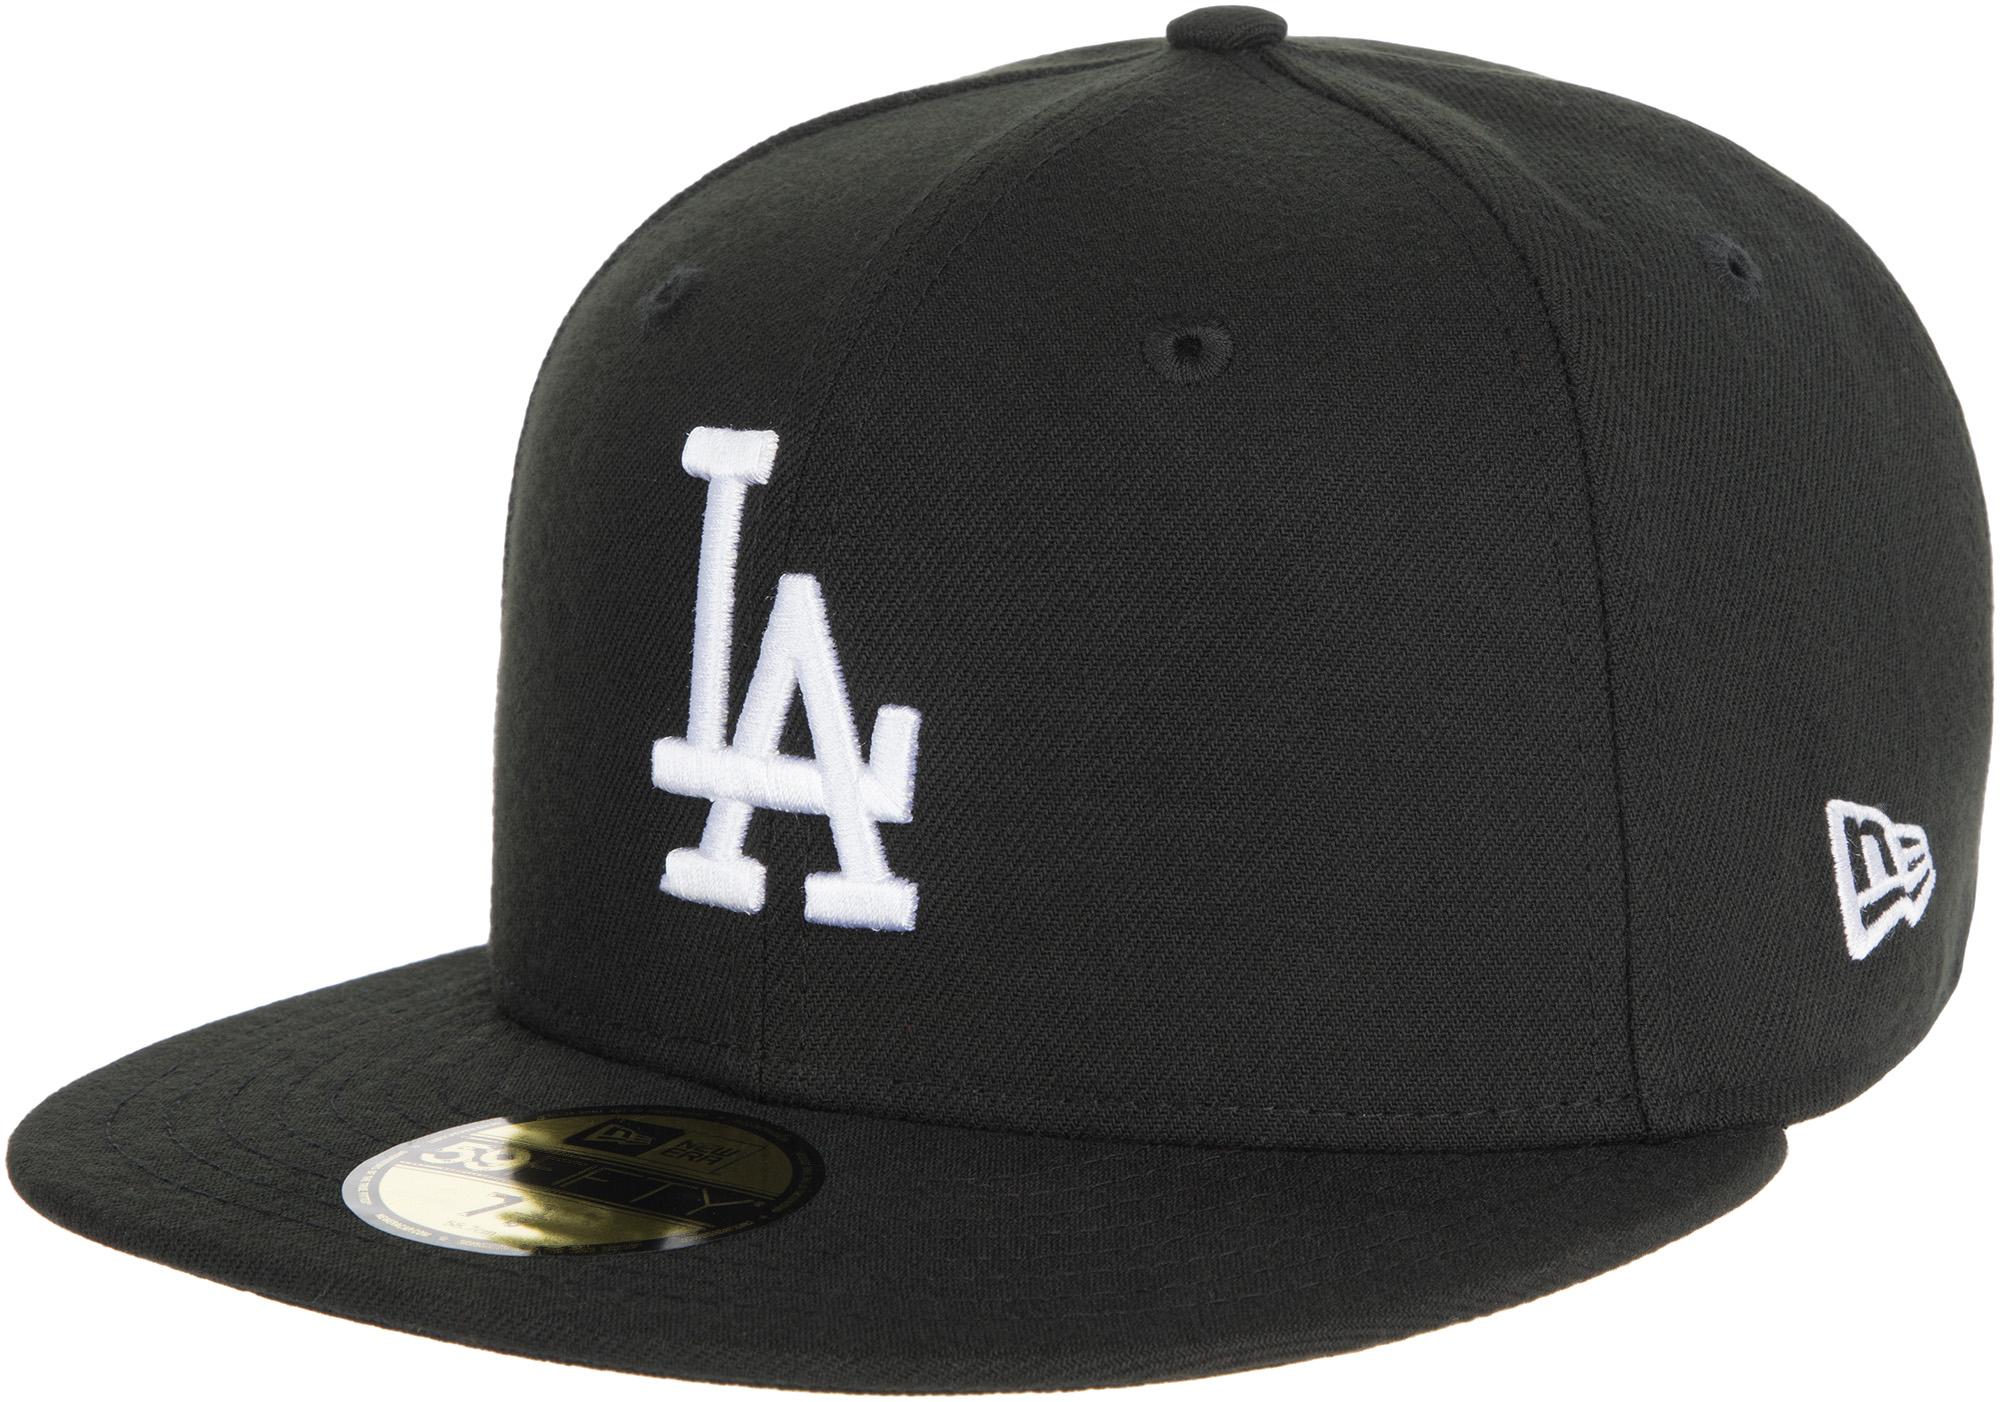 New Era Бейсболка New Era MLB Los Angeles Dodgers, размер 58 головной убор new era 59fifty los angeles dodgers mlb